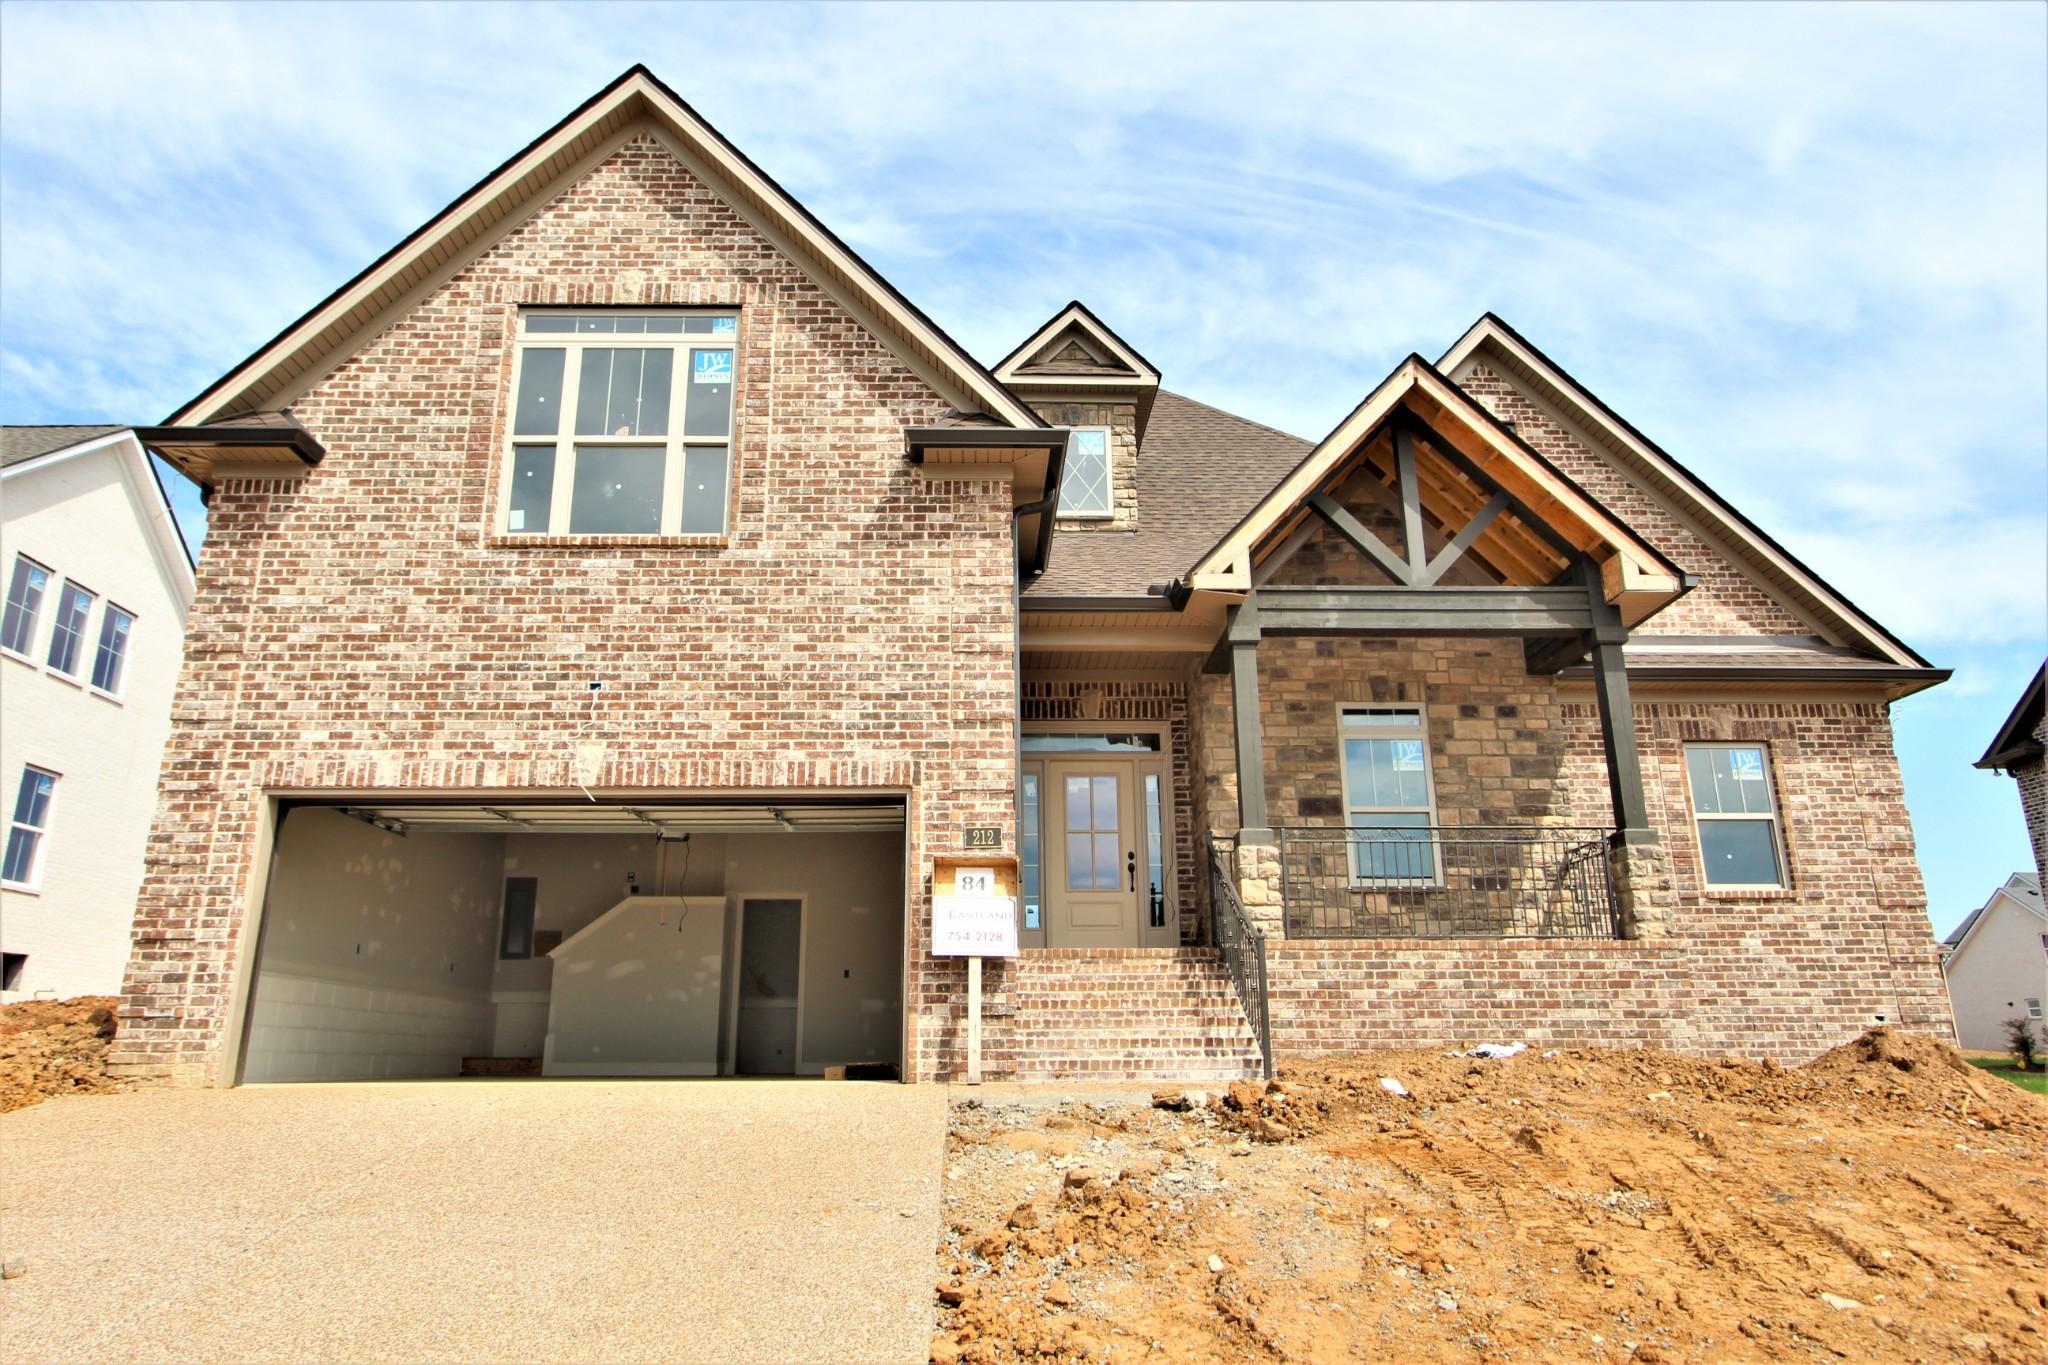 84 Ernest Dr #84, Lebanon, TN 37087 - Lebanon, TN real estate listing